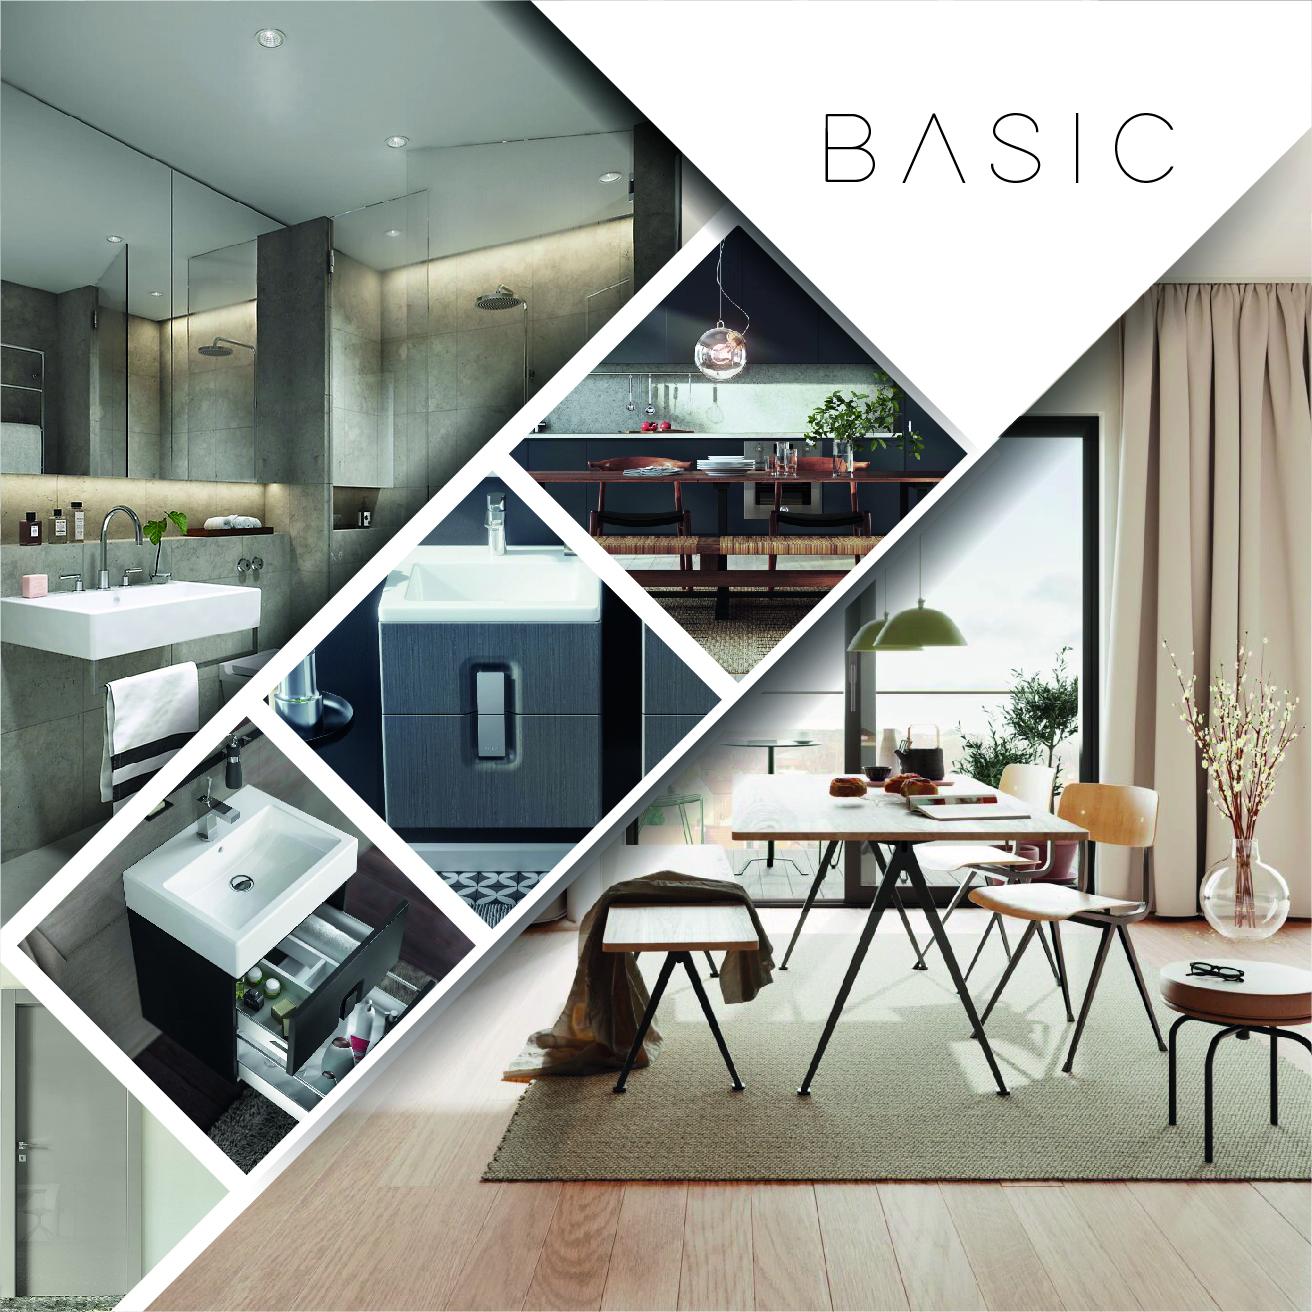 projekt katalogu basic_1